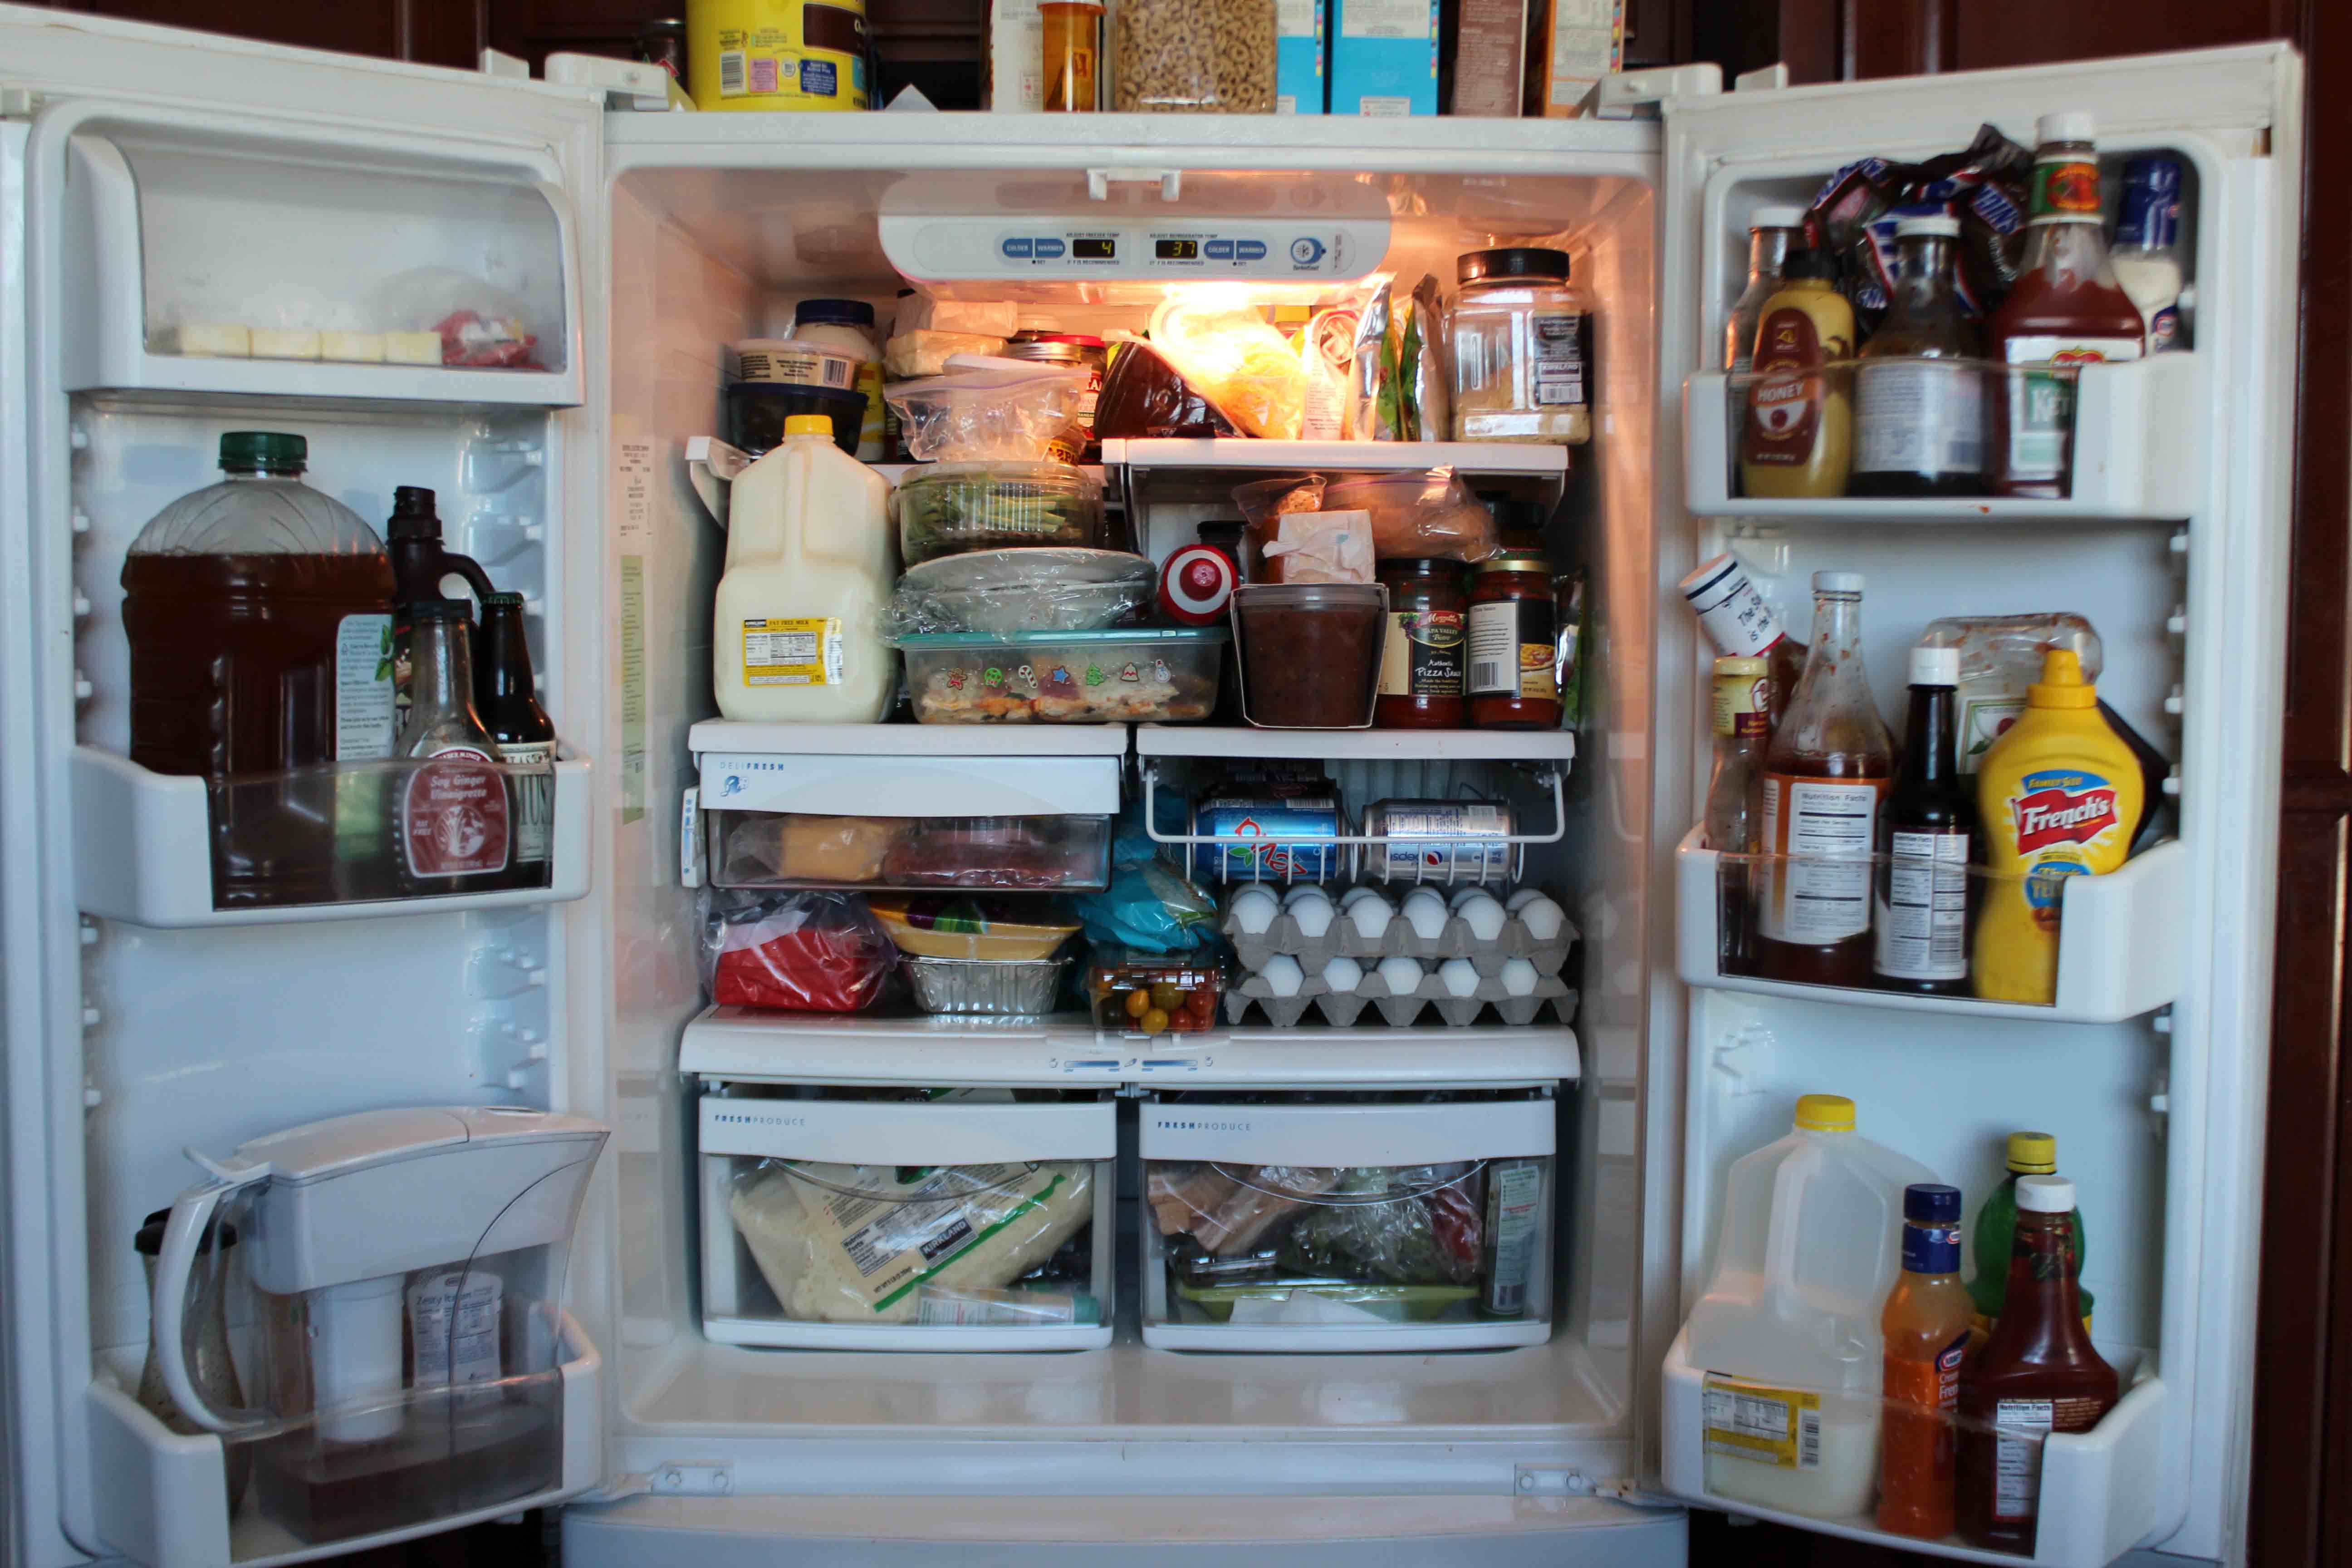 My Dirty Refrigerator Common Sense Country Girl